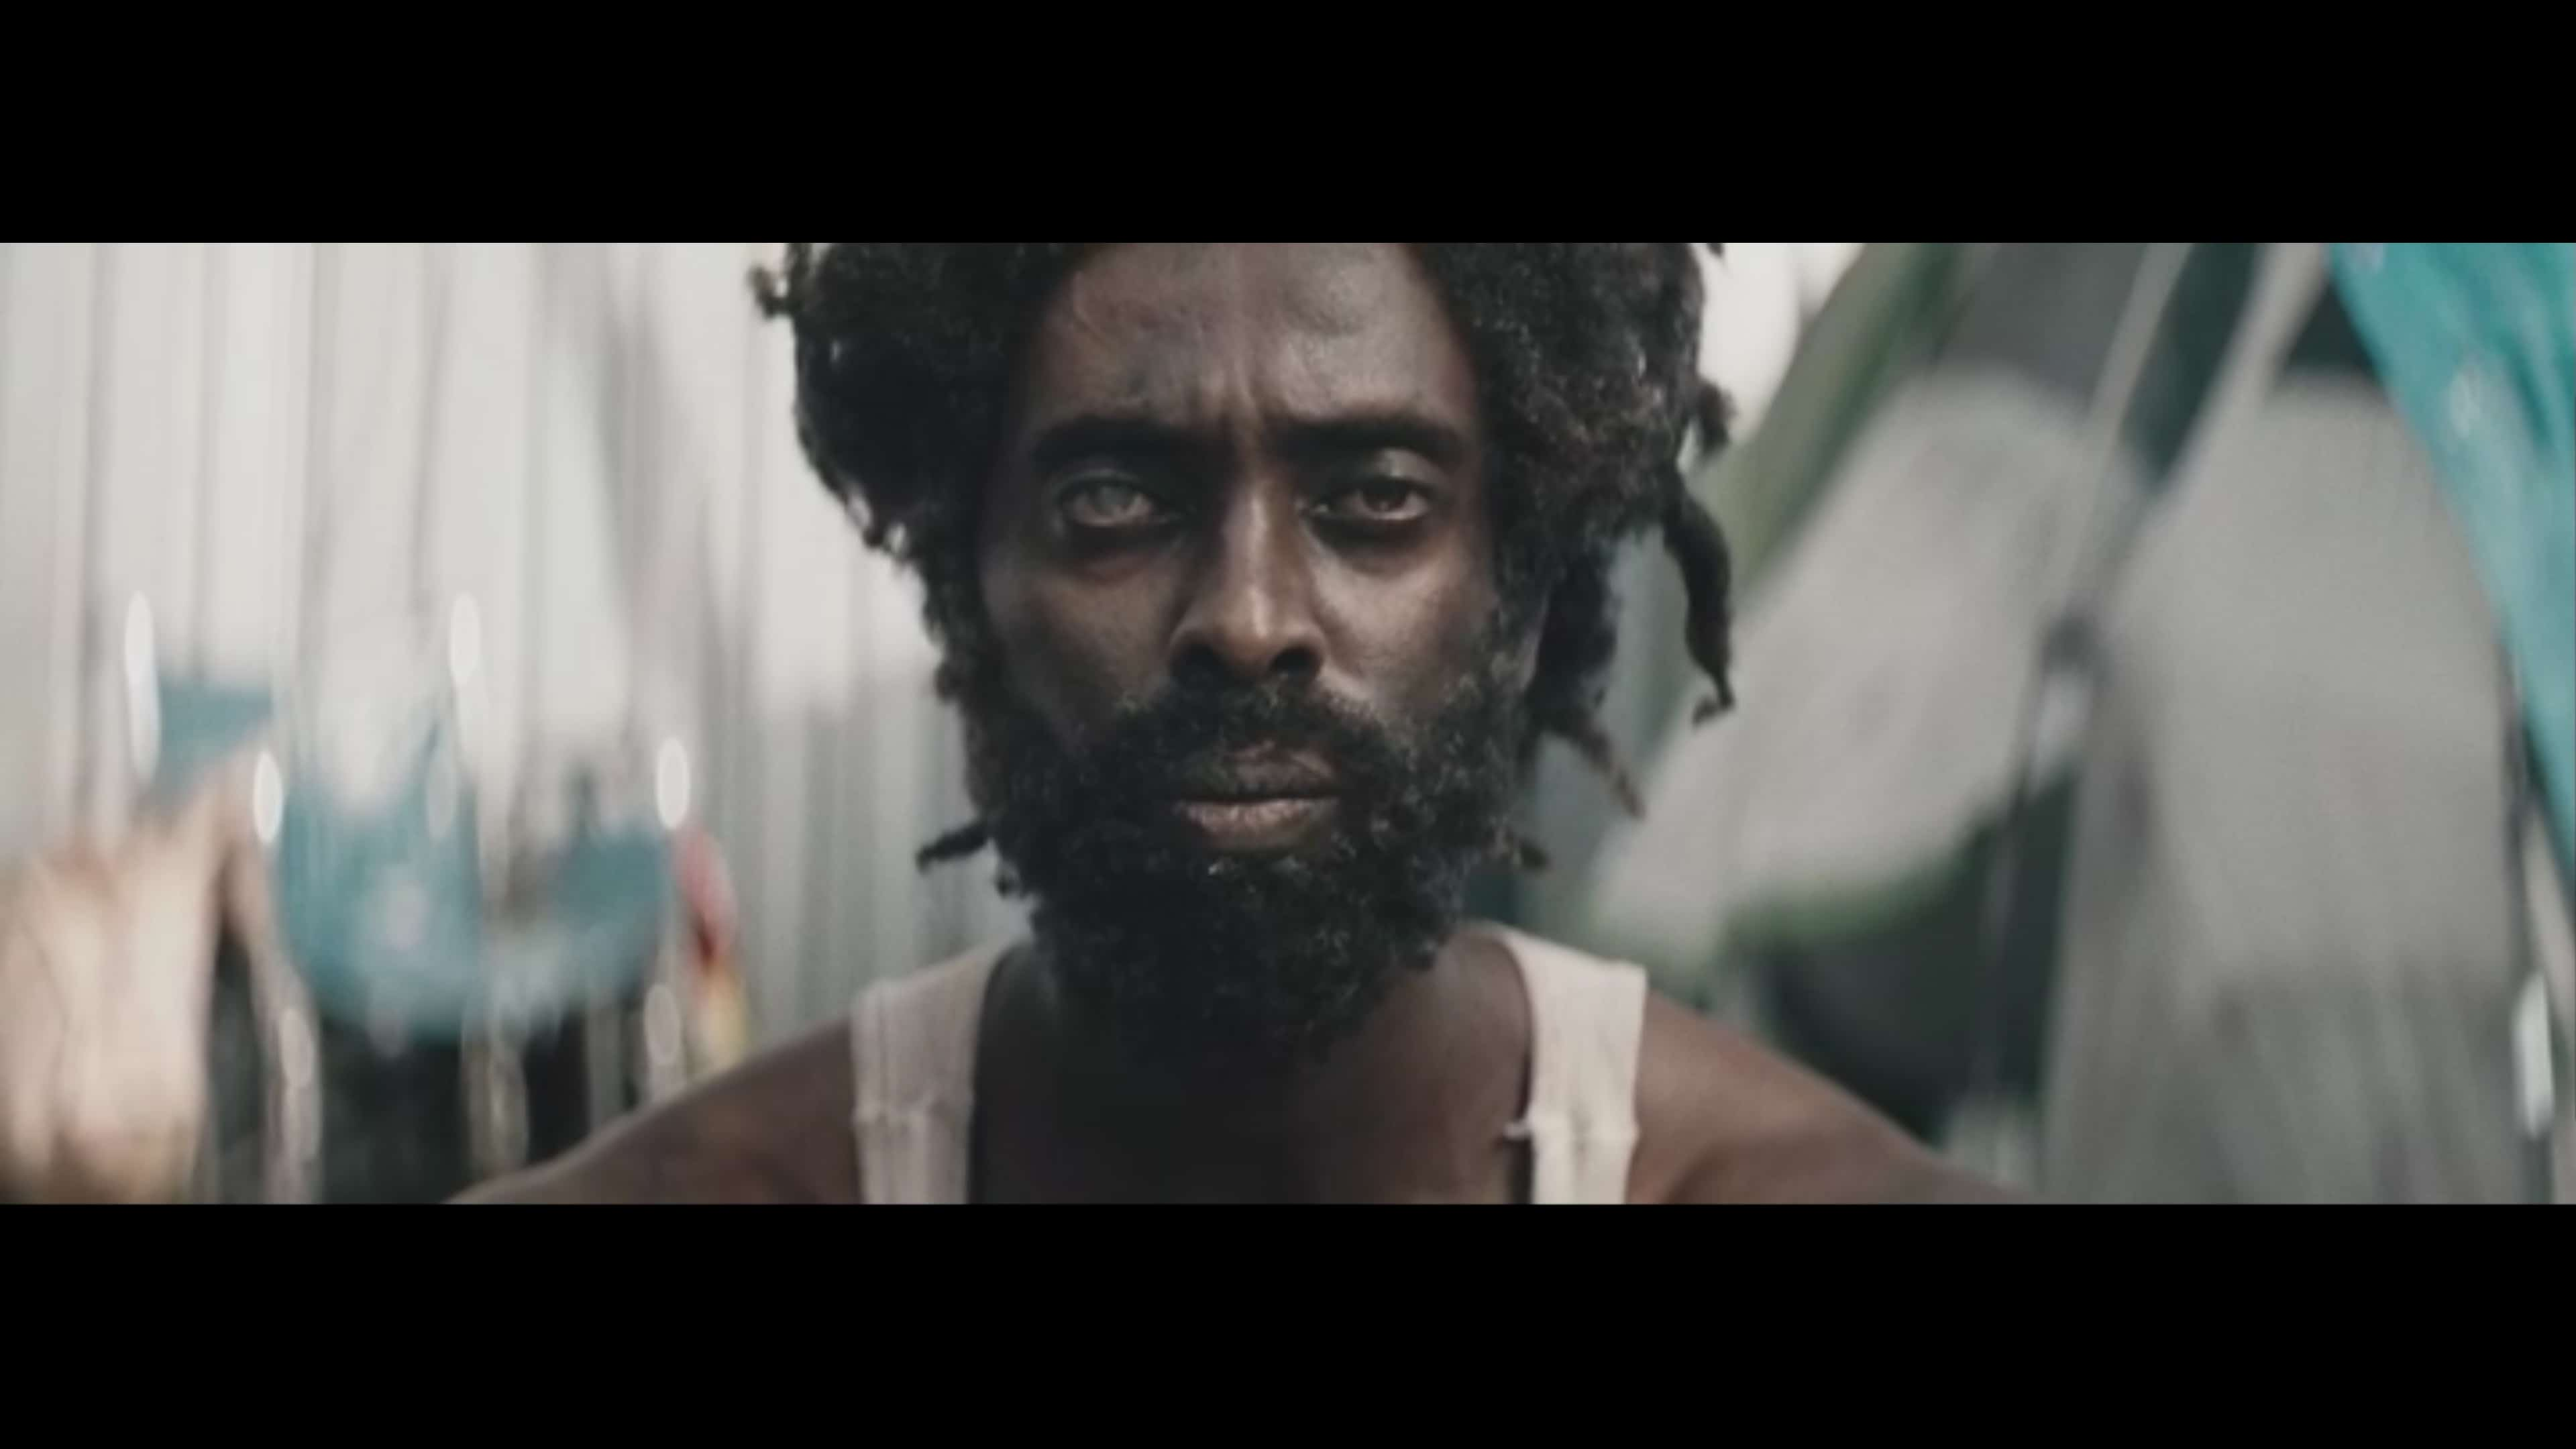 Bo (Edi Gathegi) after being homeless